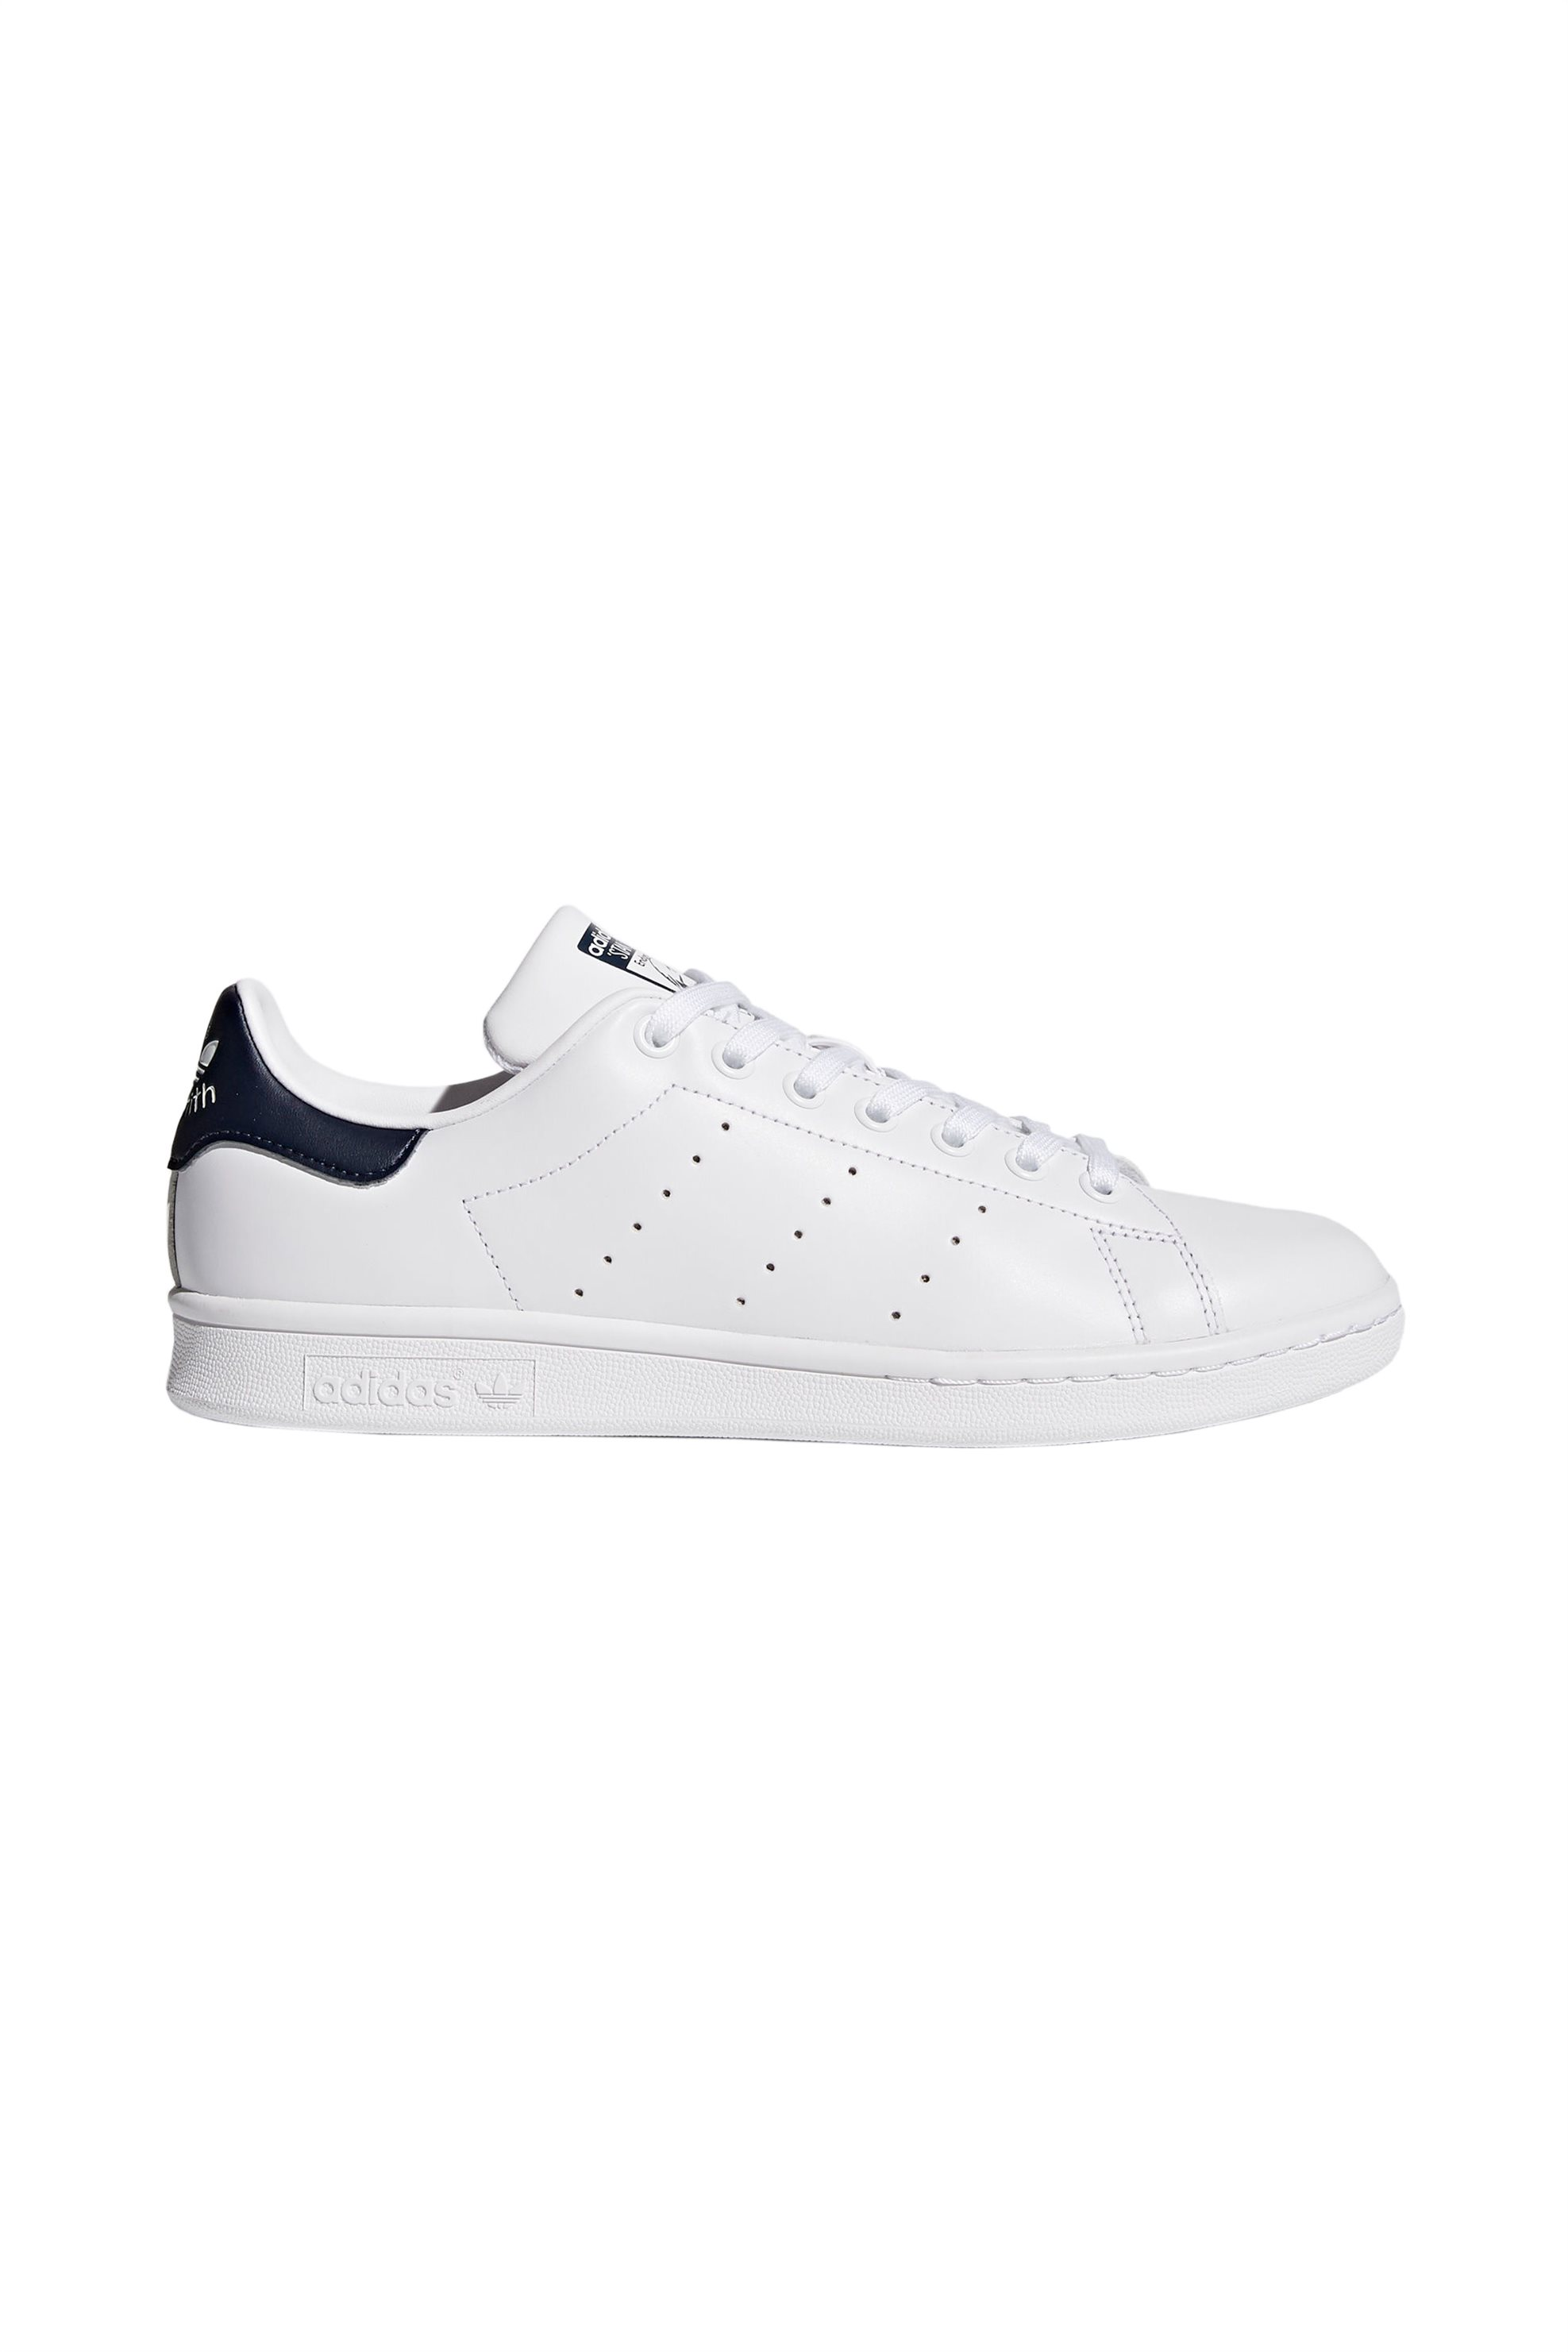 Adidas ανδρικά αθλητικά παπούτσια Stan Smith λευκά – M20325 – Λευκό